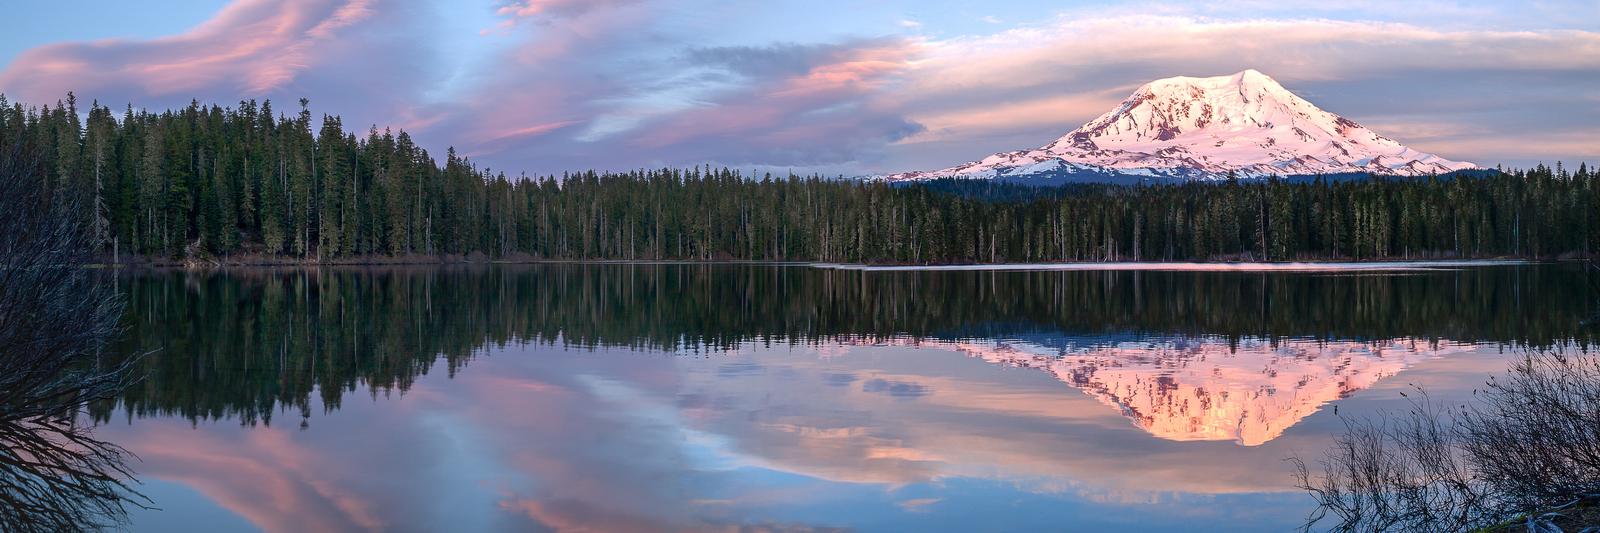 Takhlakh-sunset-Cloudscape-Pano-1600x533_7708.jpg